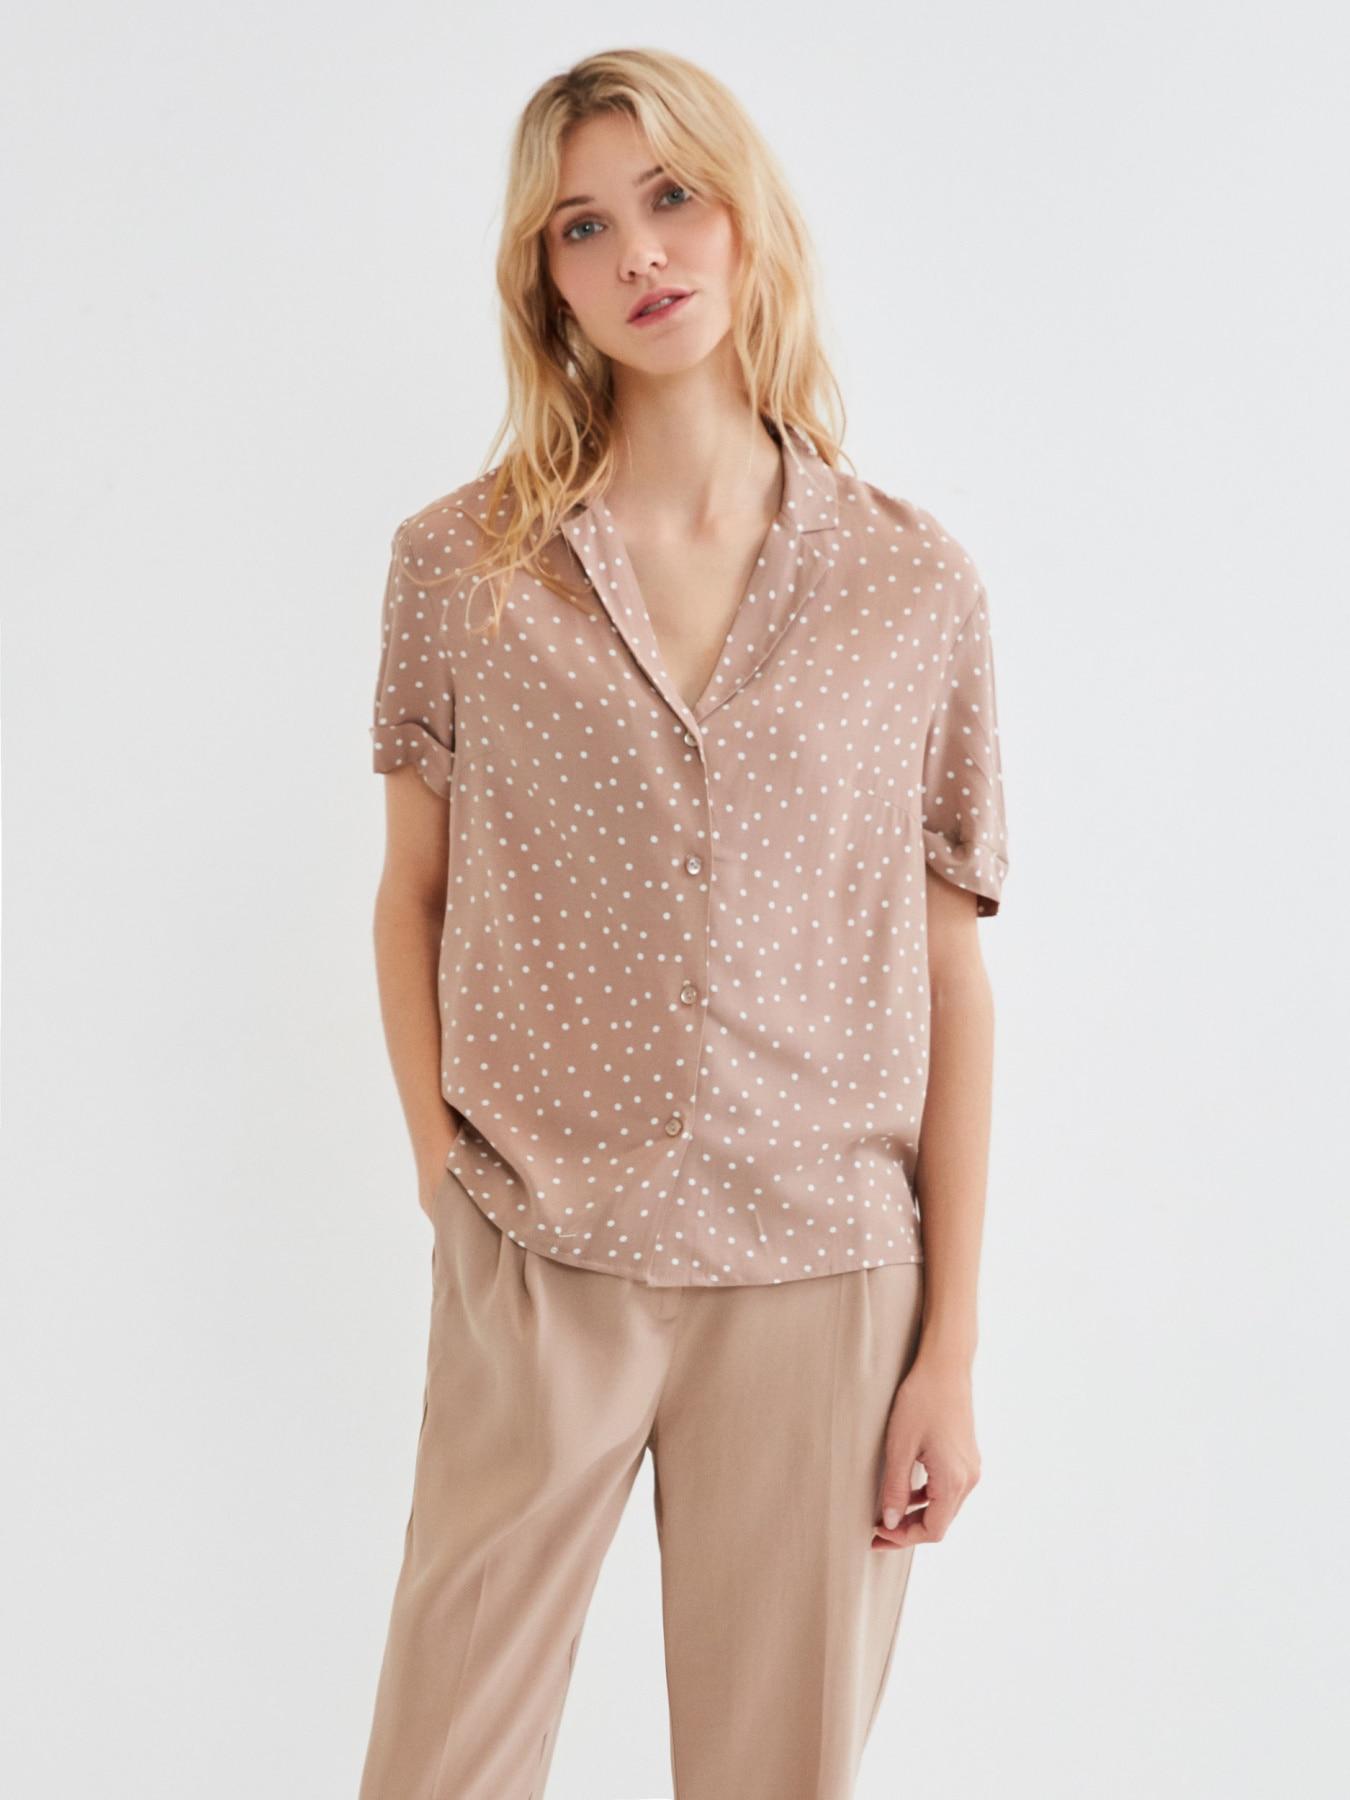 Летняя блузка 0225000303|Блузки| | АлиЭкспресс